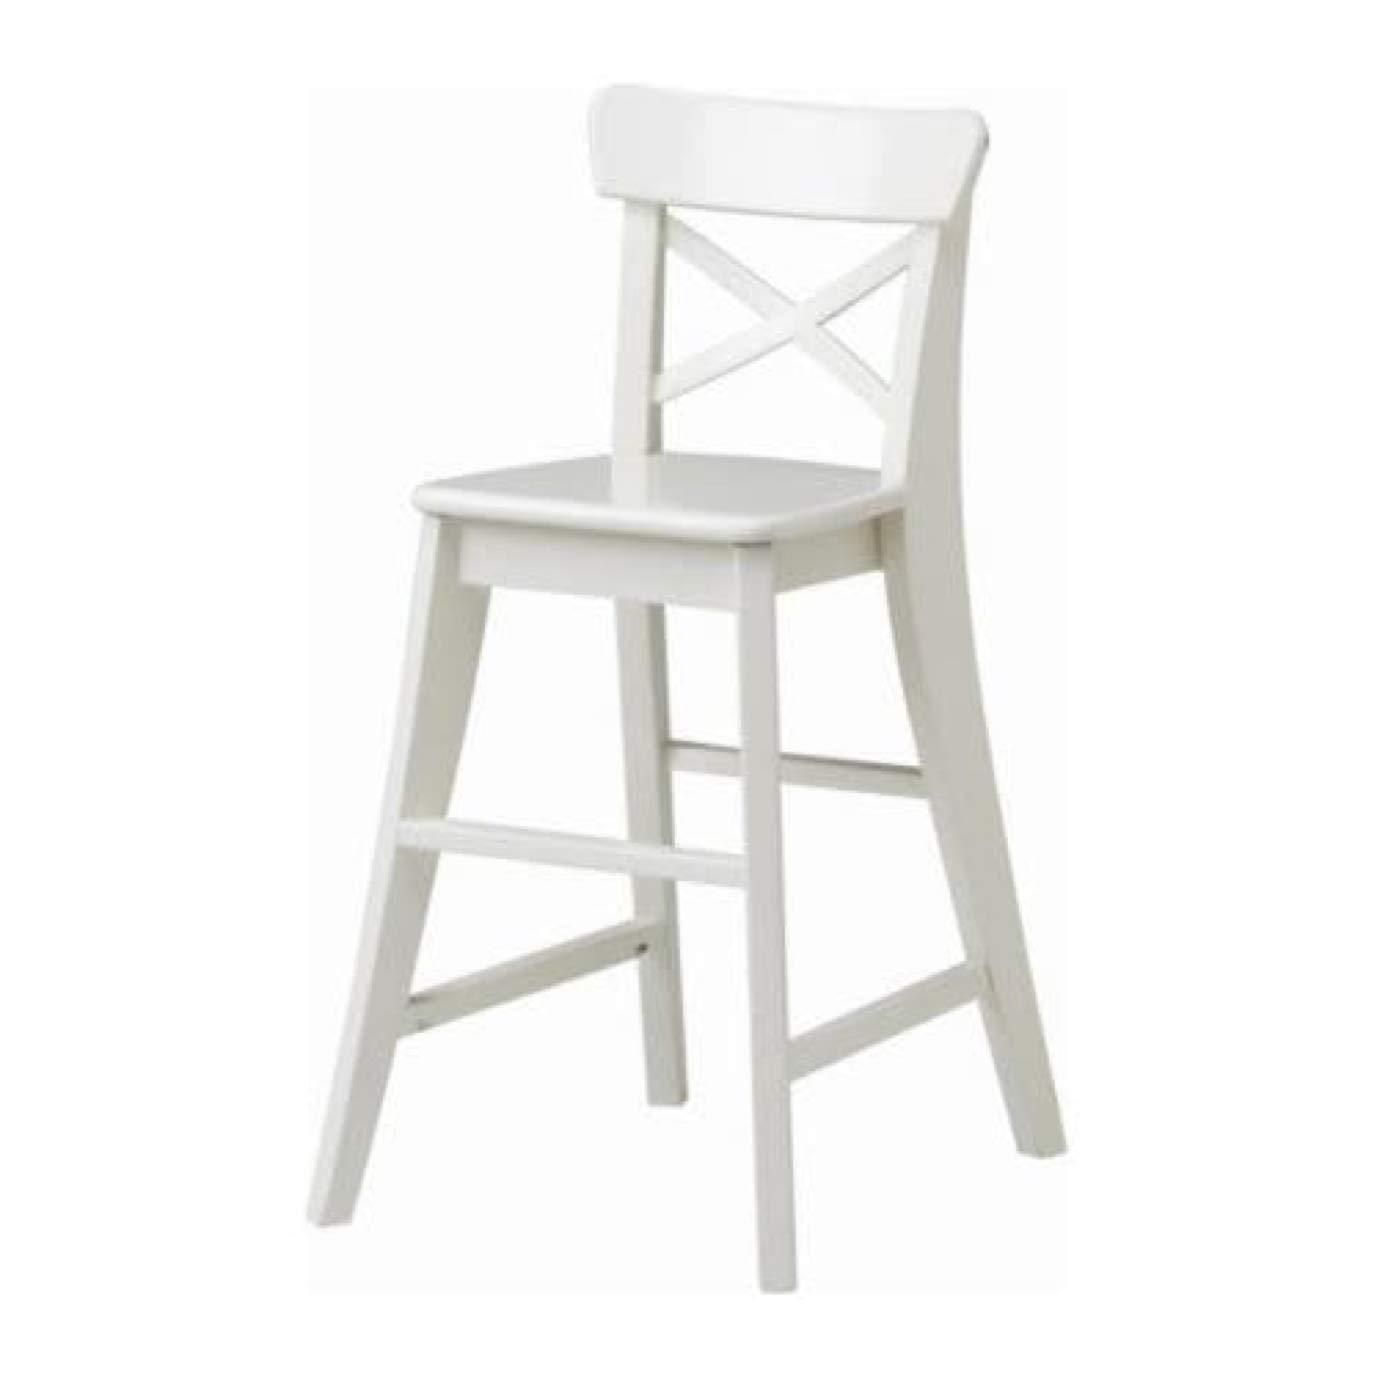 Awe Inspiring Amazon Com Ikea Ingolf Junior Chair White 901 464 56 Home Andrewgaddart Wooden Chair Designs For Living Room Andrewgaddartcom